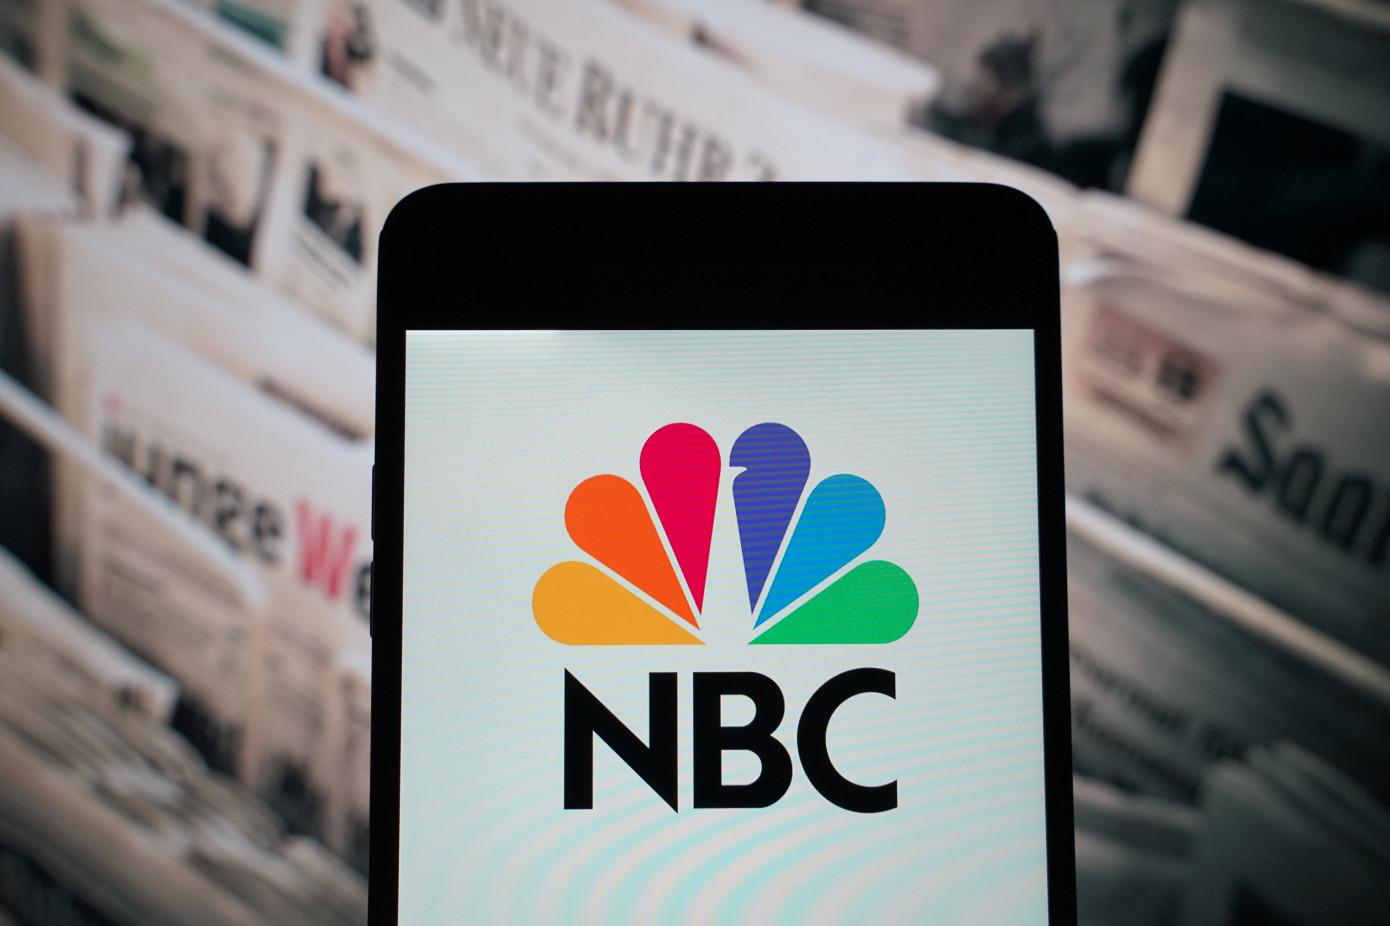 NBC logo as seen on smartphone